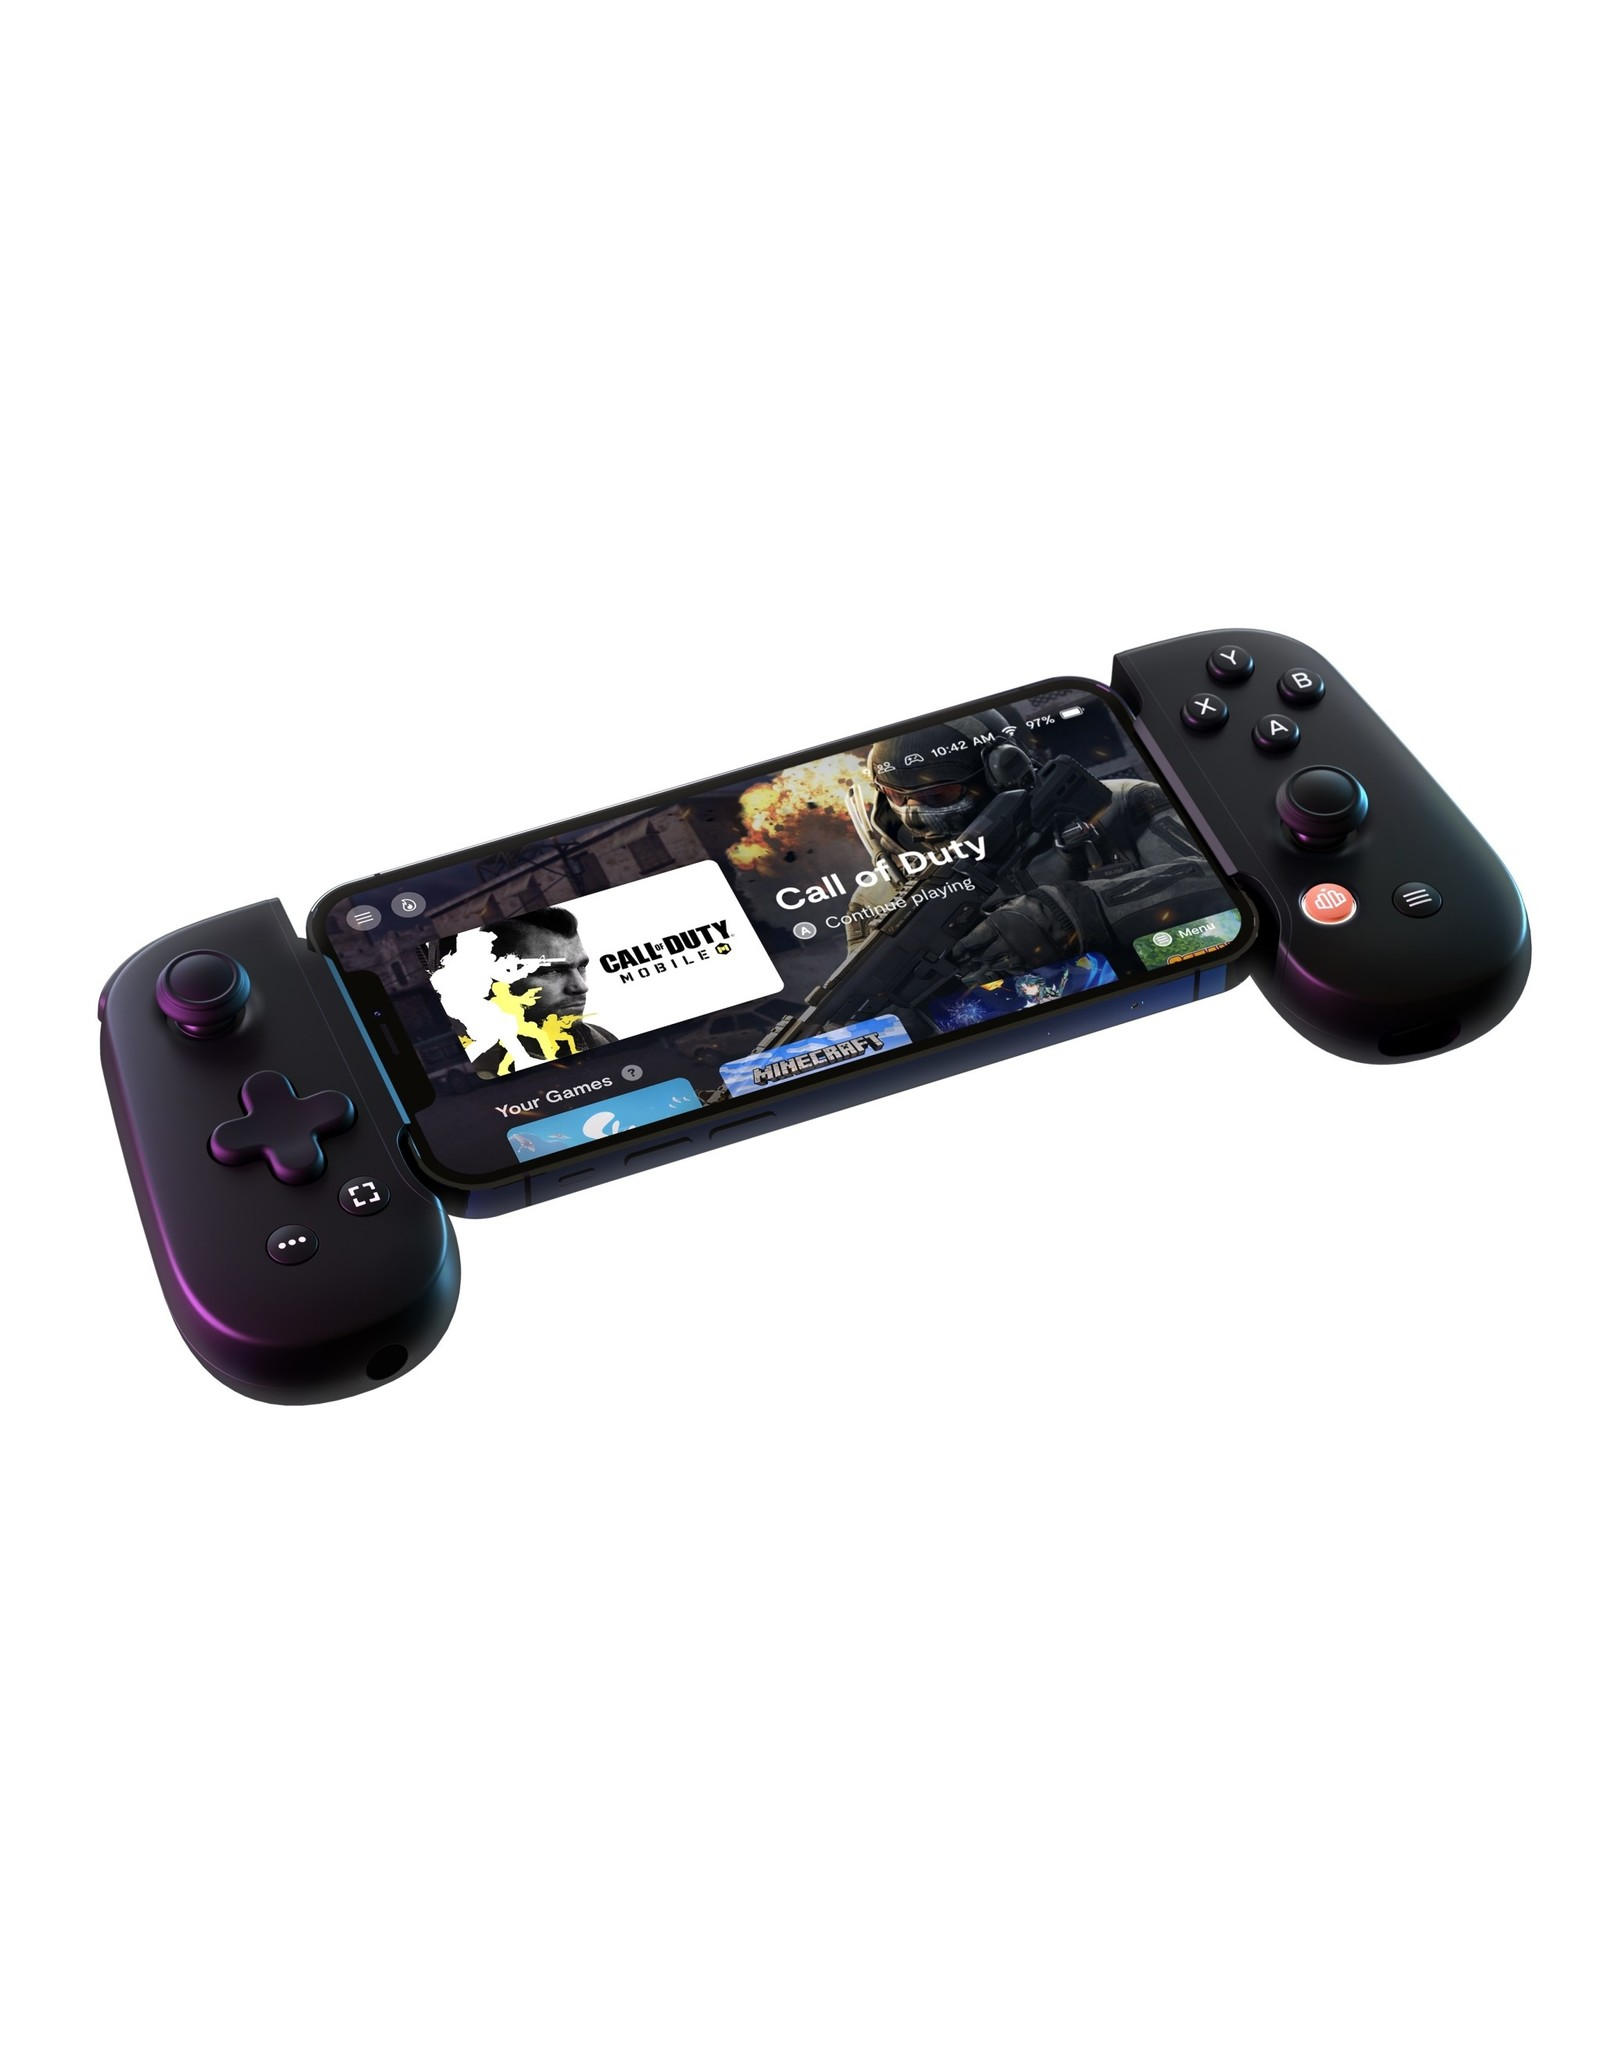 Backbone Backbone One - iPhone Mobile Gaming Controller / Gamepad